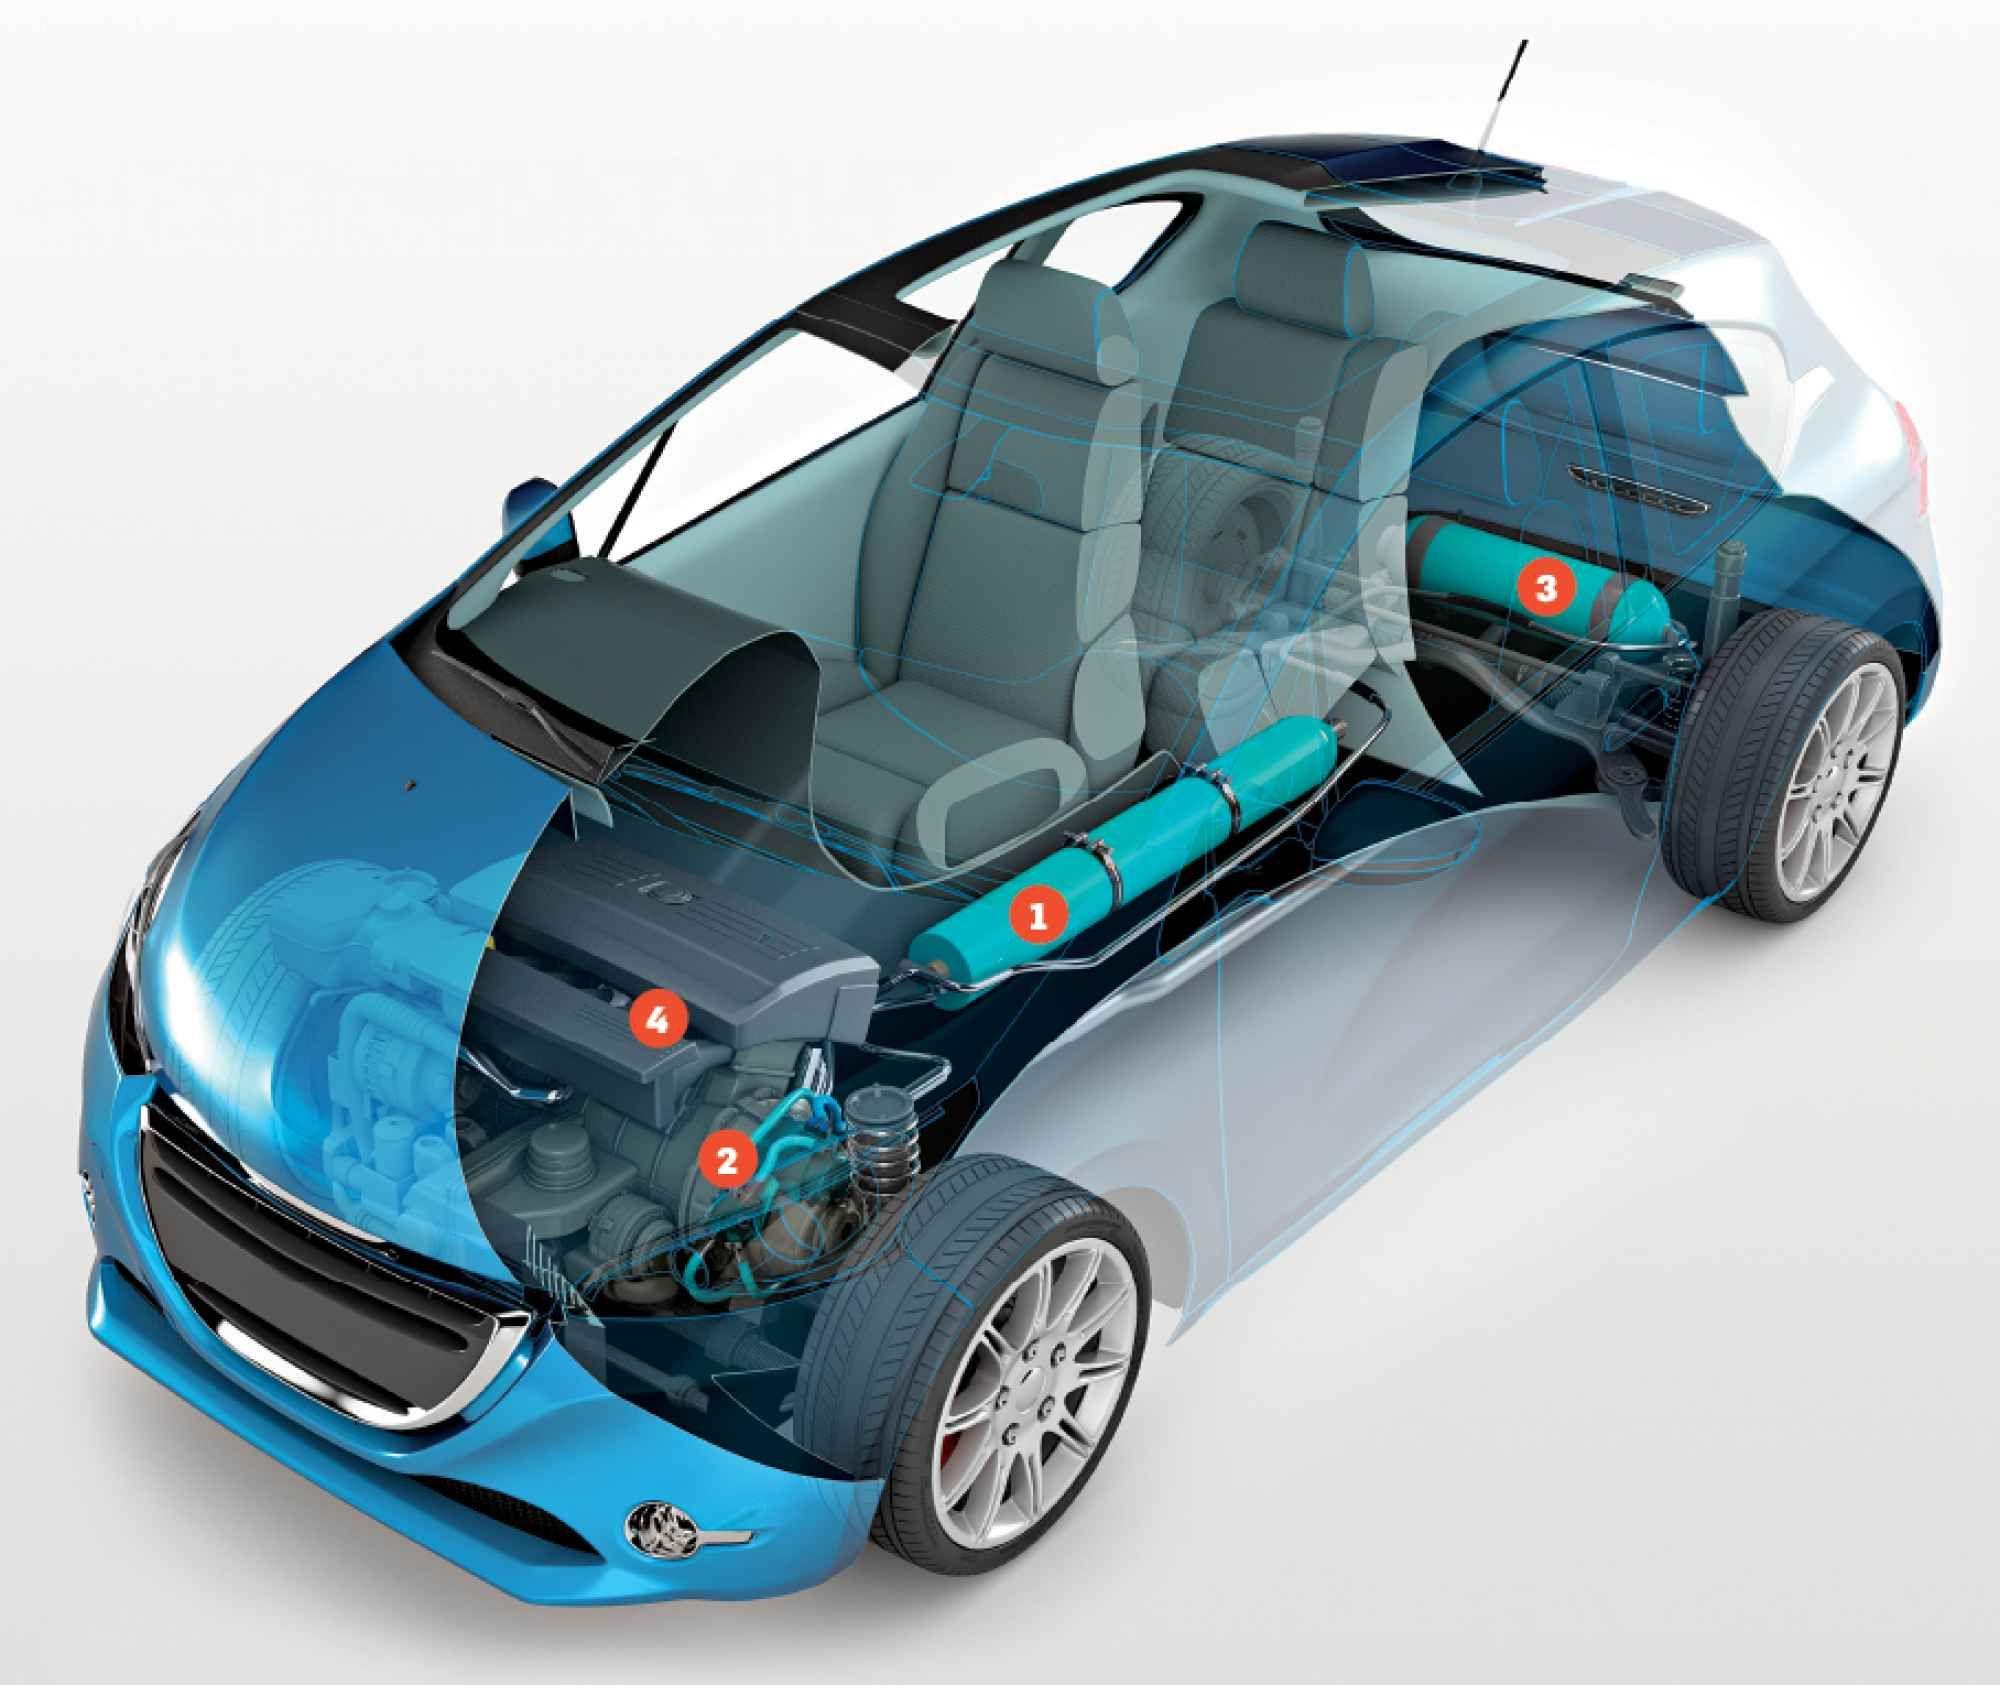 Car That Runs On Air >> The Car That Runs On Air Mezcla Car Air Car Power Cars